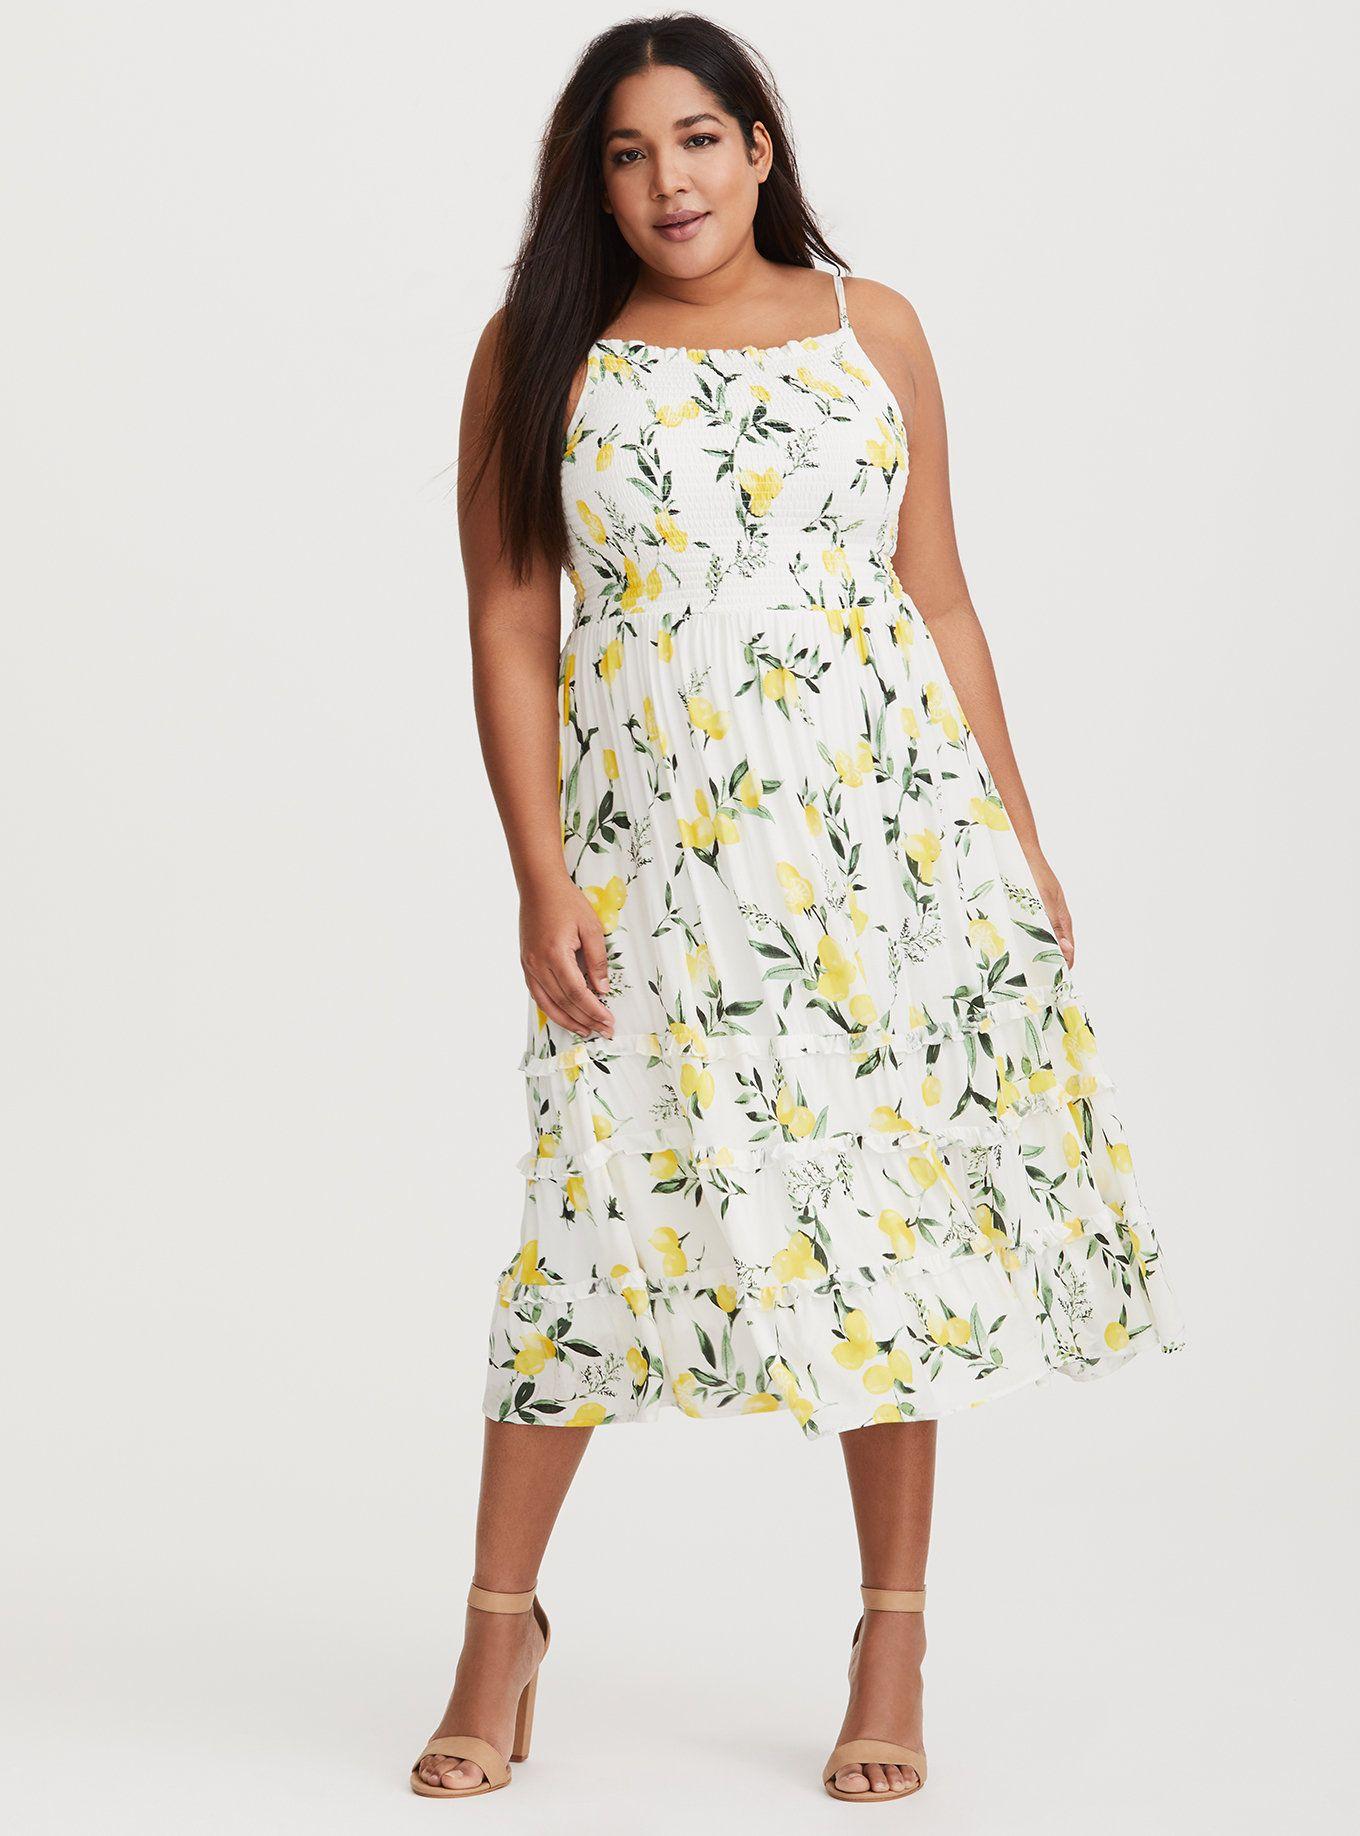 White Lemon Smocked Midi Dress Midi Dress Floral Chiffon Dress Dresses [ 1836 x 1360 Pixel ]